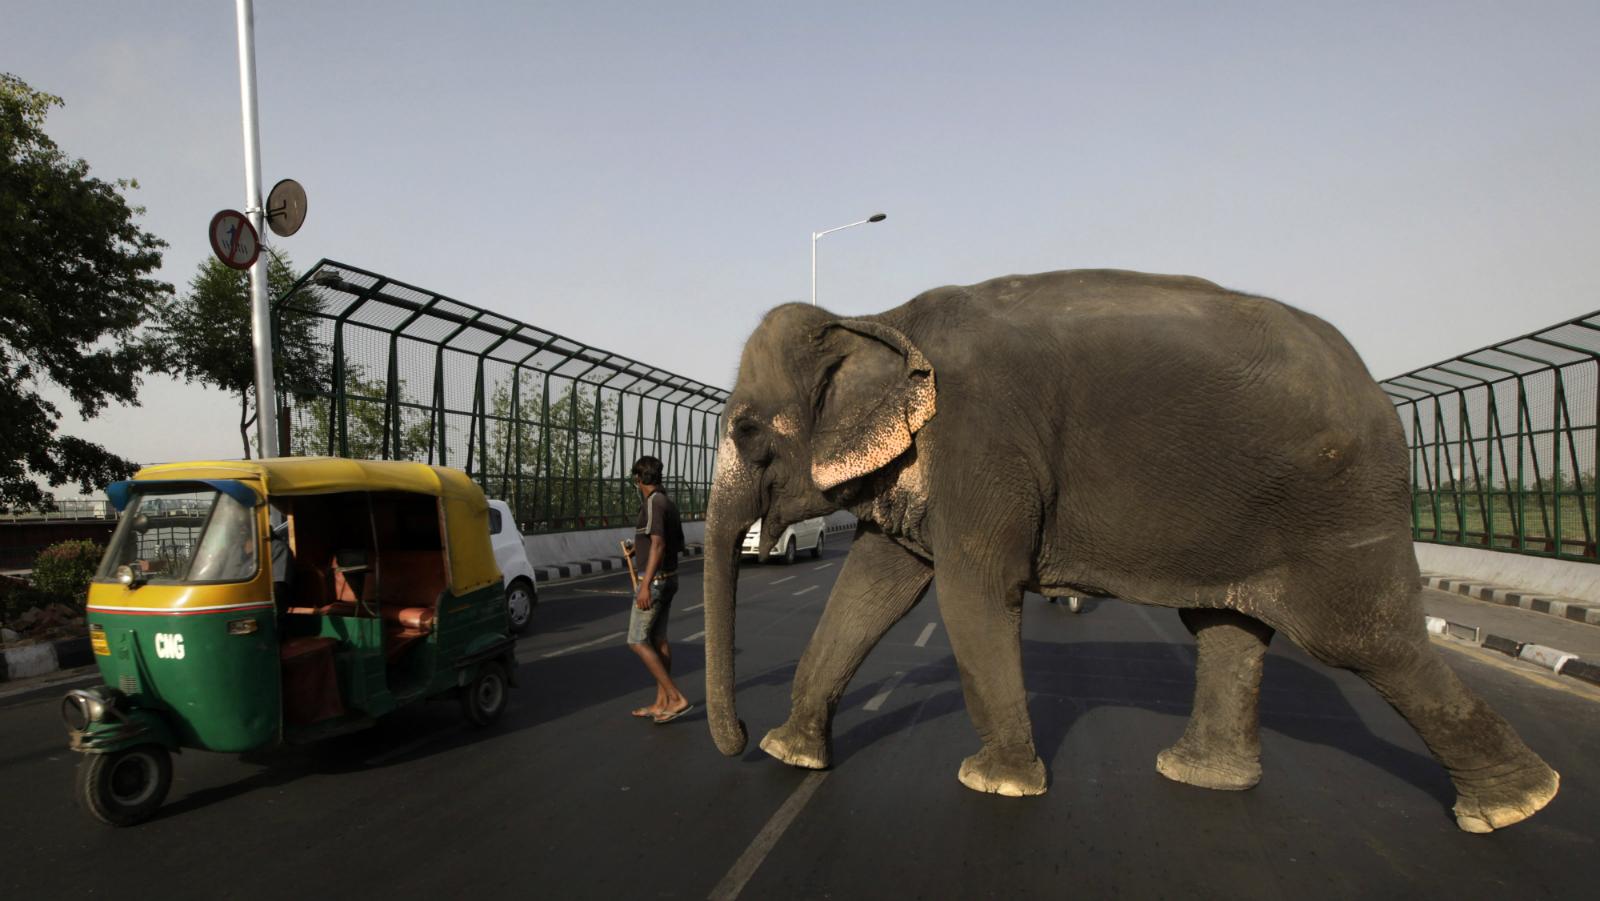 Driverless car autonomous India